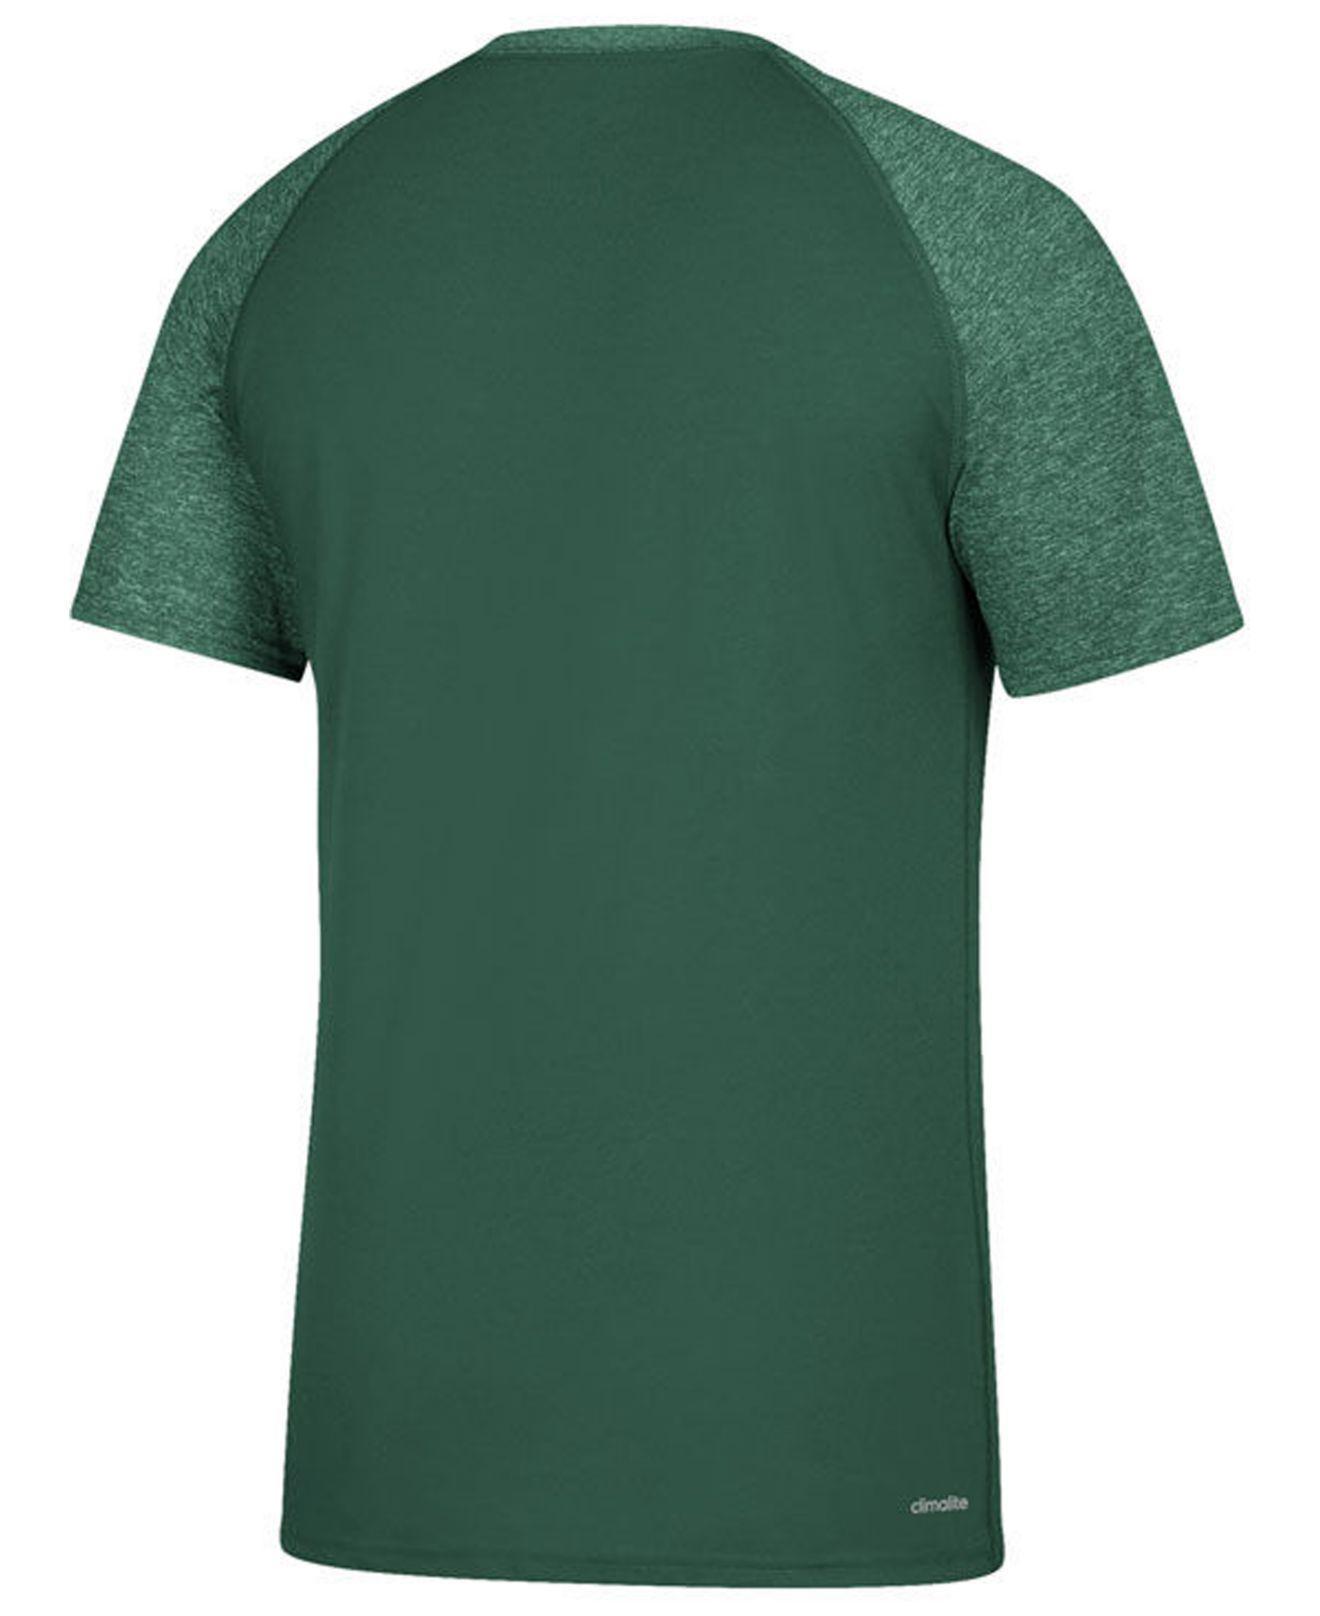 Lyst - adidas Miami Hurricanes Sideline Say It Loud Raglan T-shirt in Green  for Men f22a70dc1